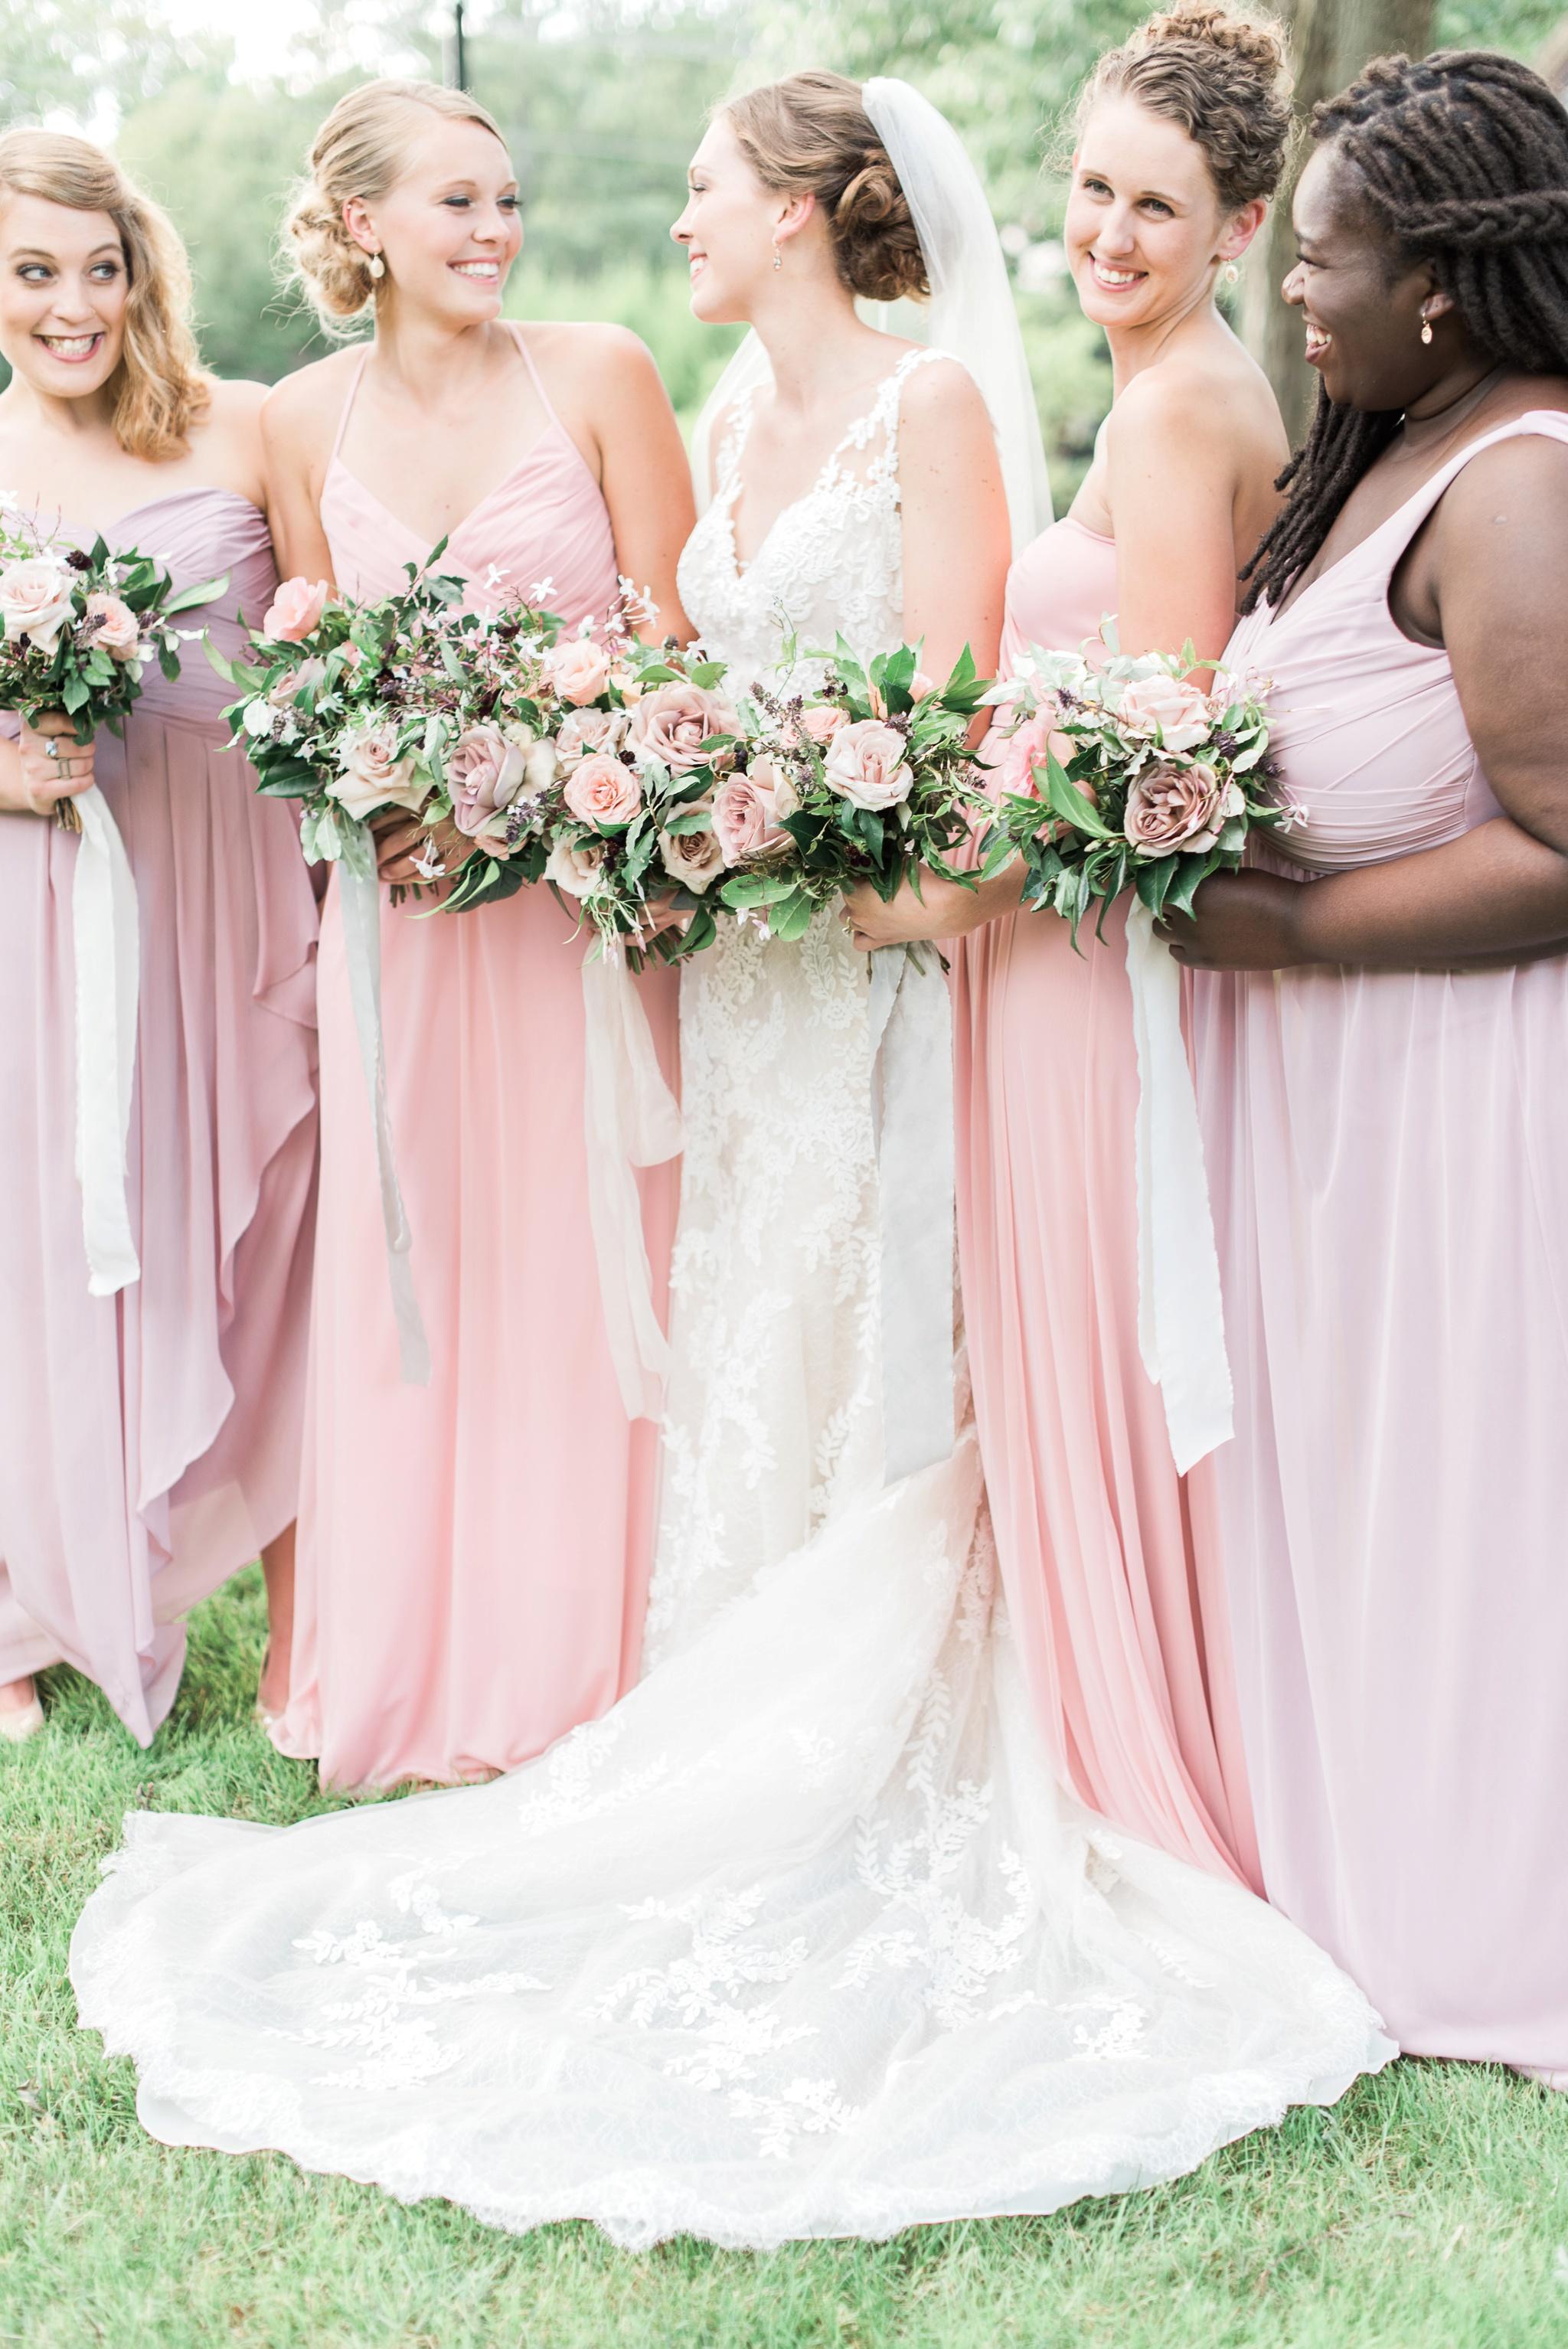 granville-inn-wedding-columbus-ohio-photographer_0052.jpg